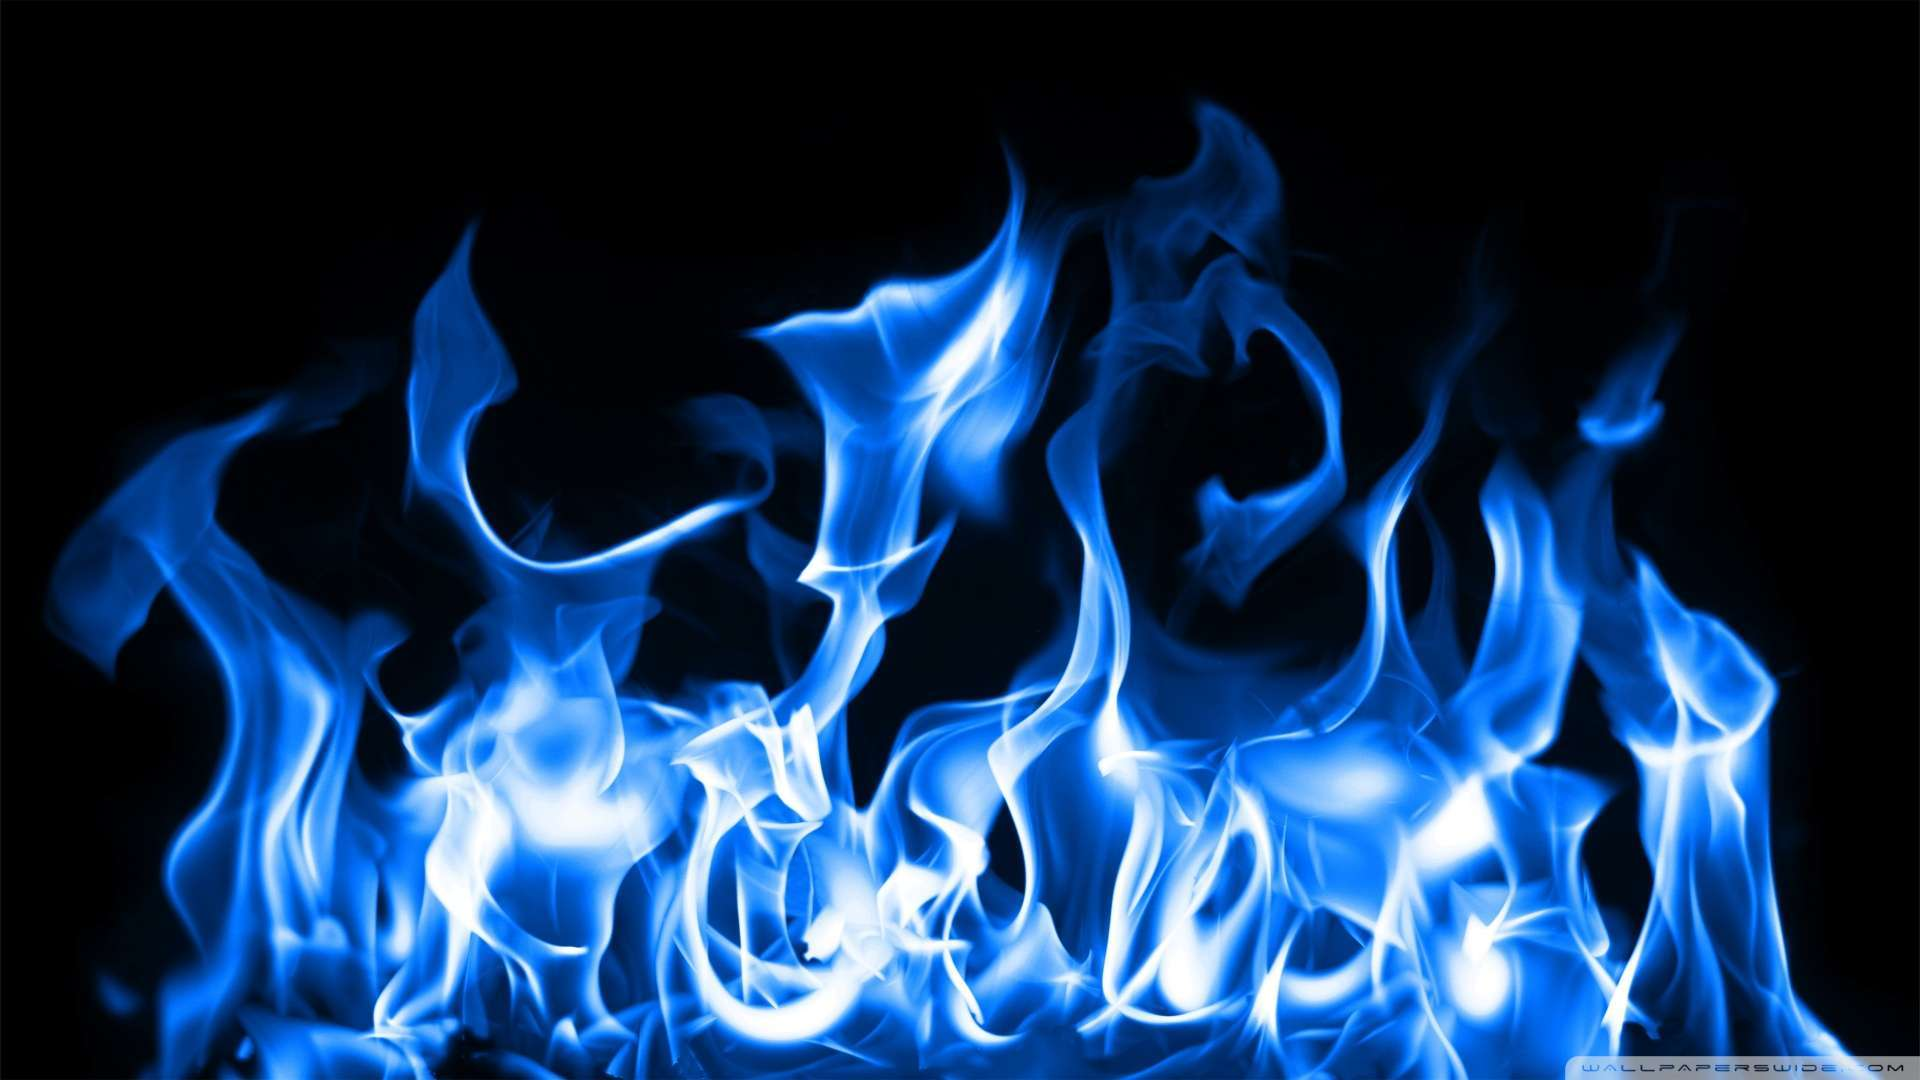 Download now Blue Fire Wallpaper 1080p HD Read description infos 1920x1080